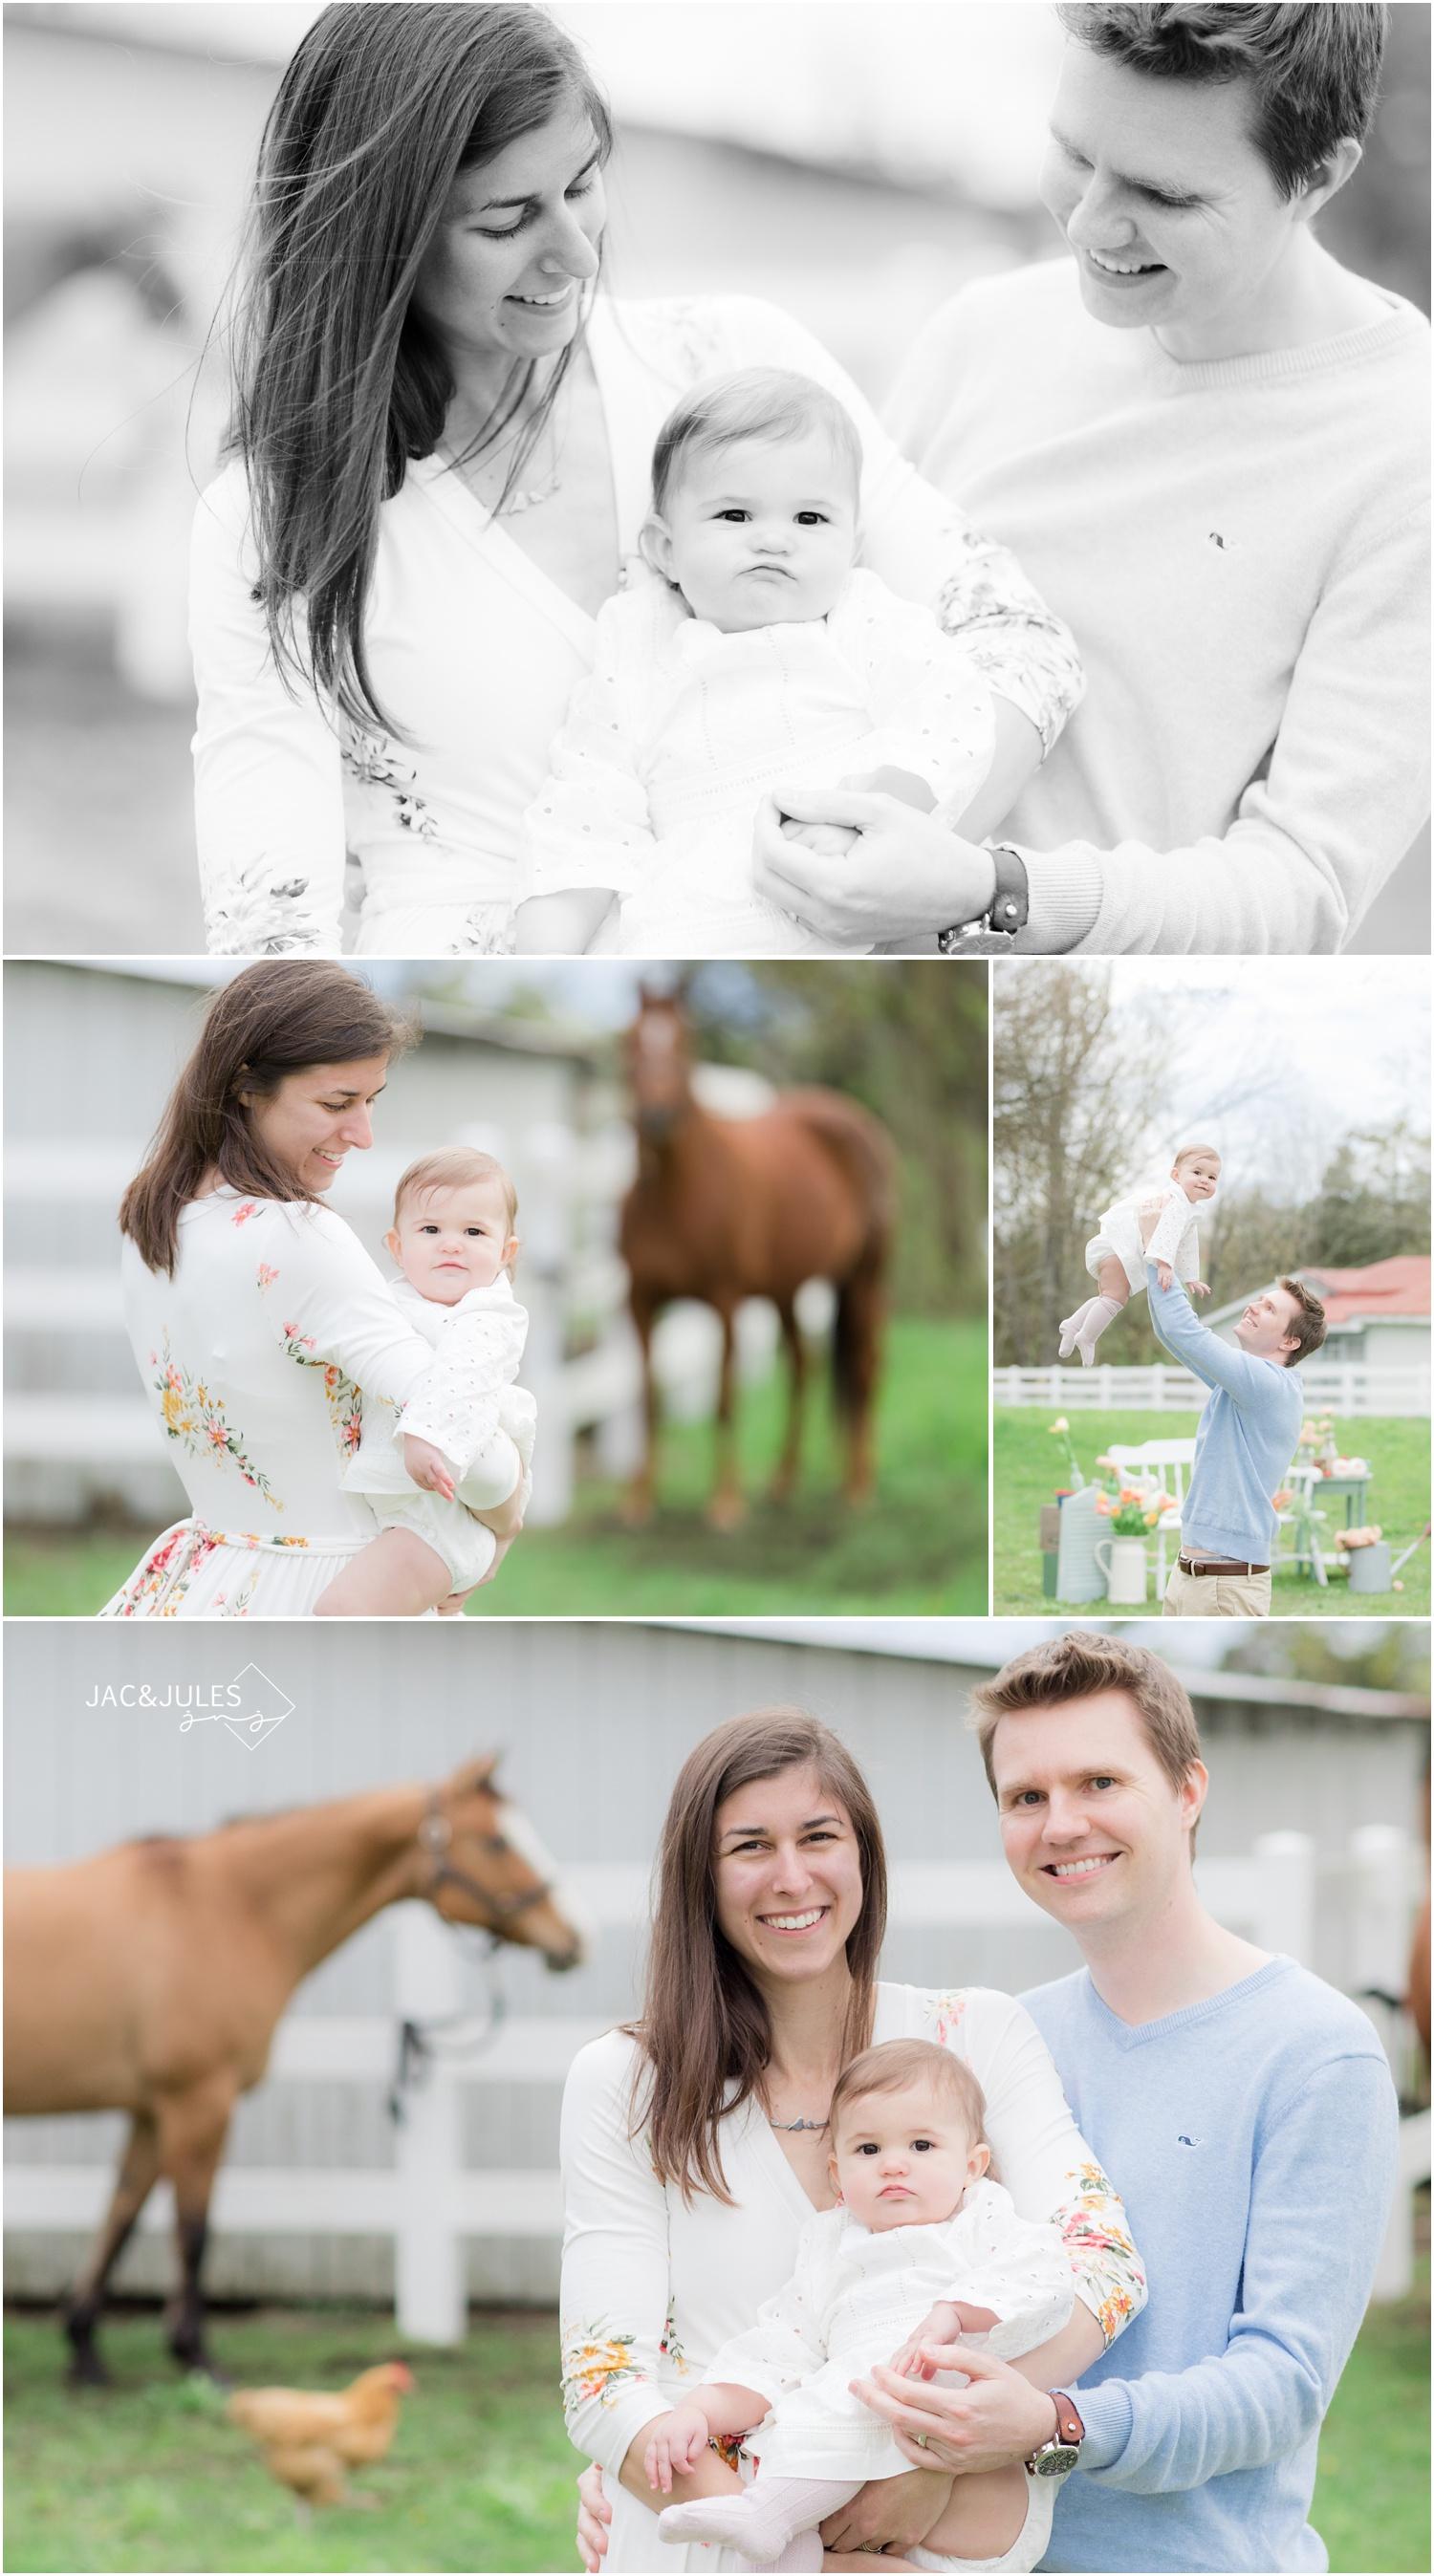 family photos at a horse farm in cream ridge, nj.